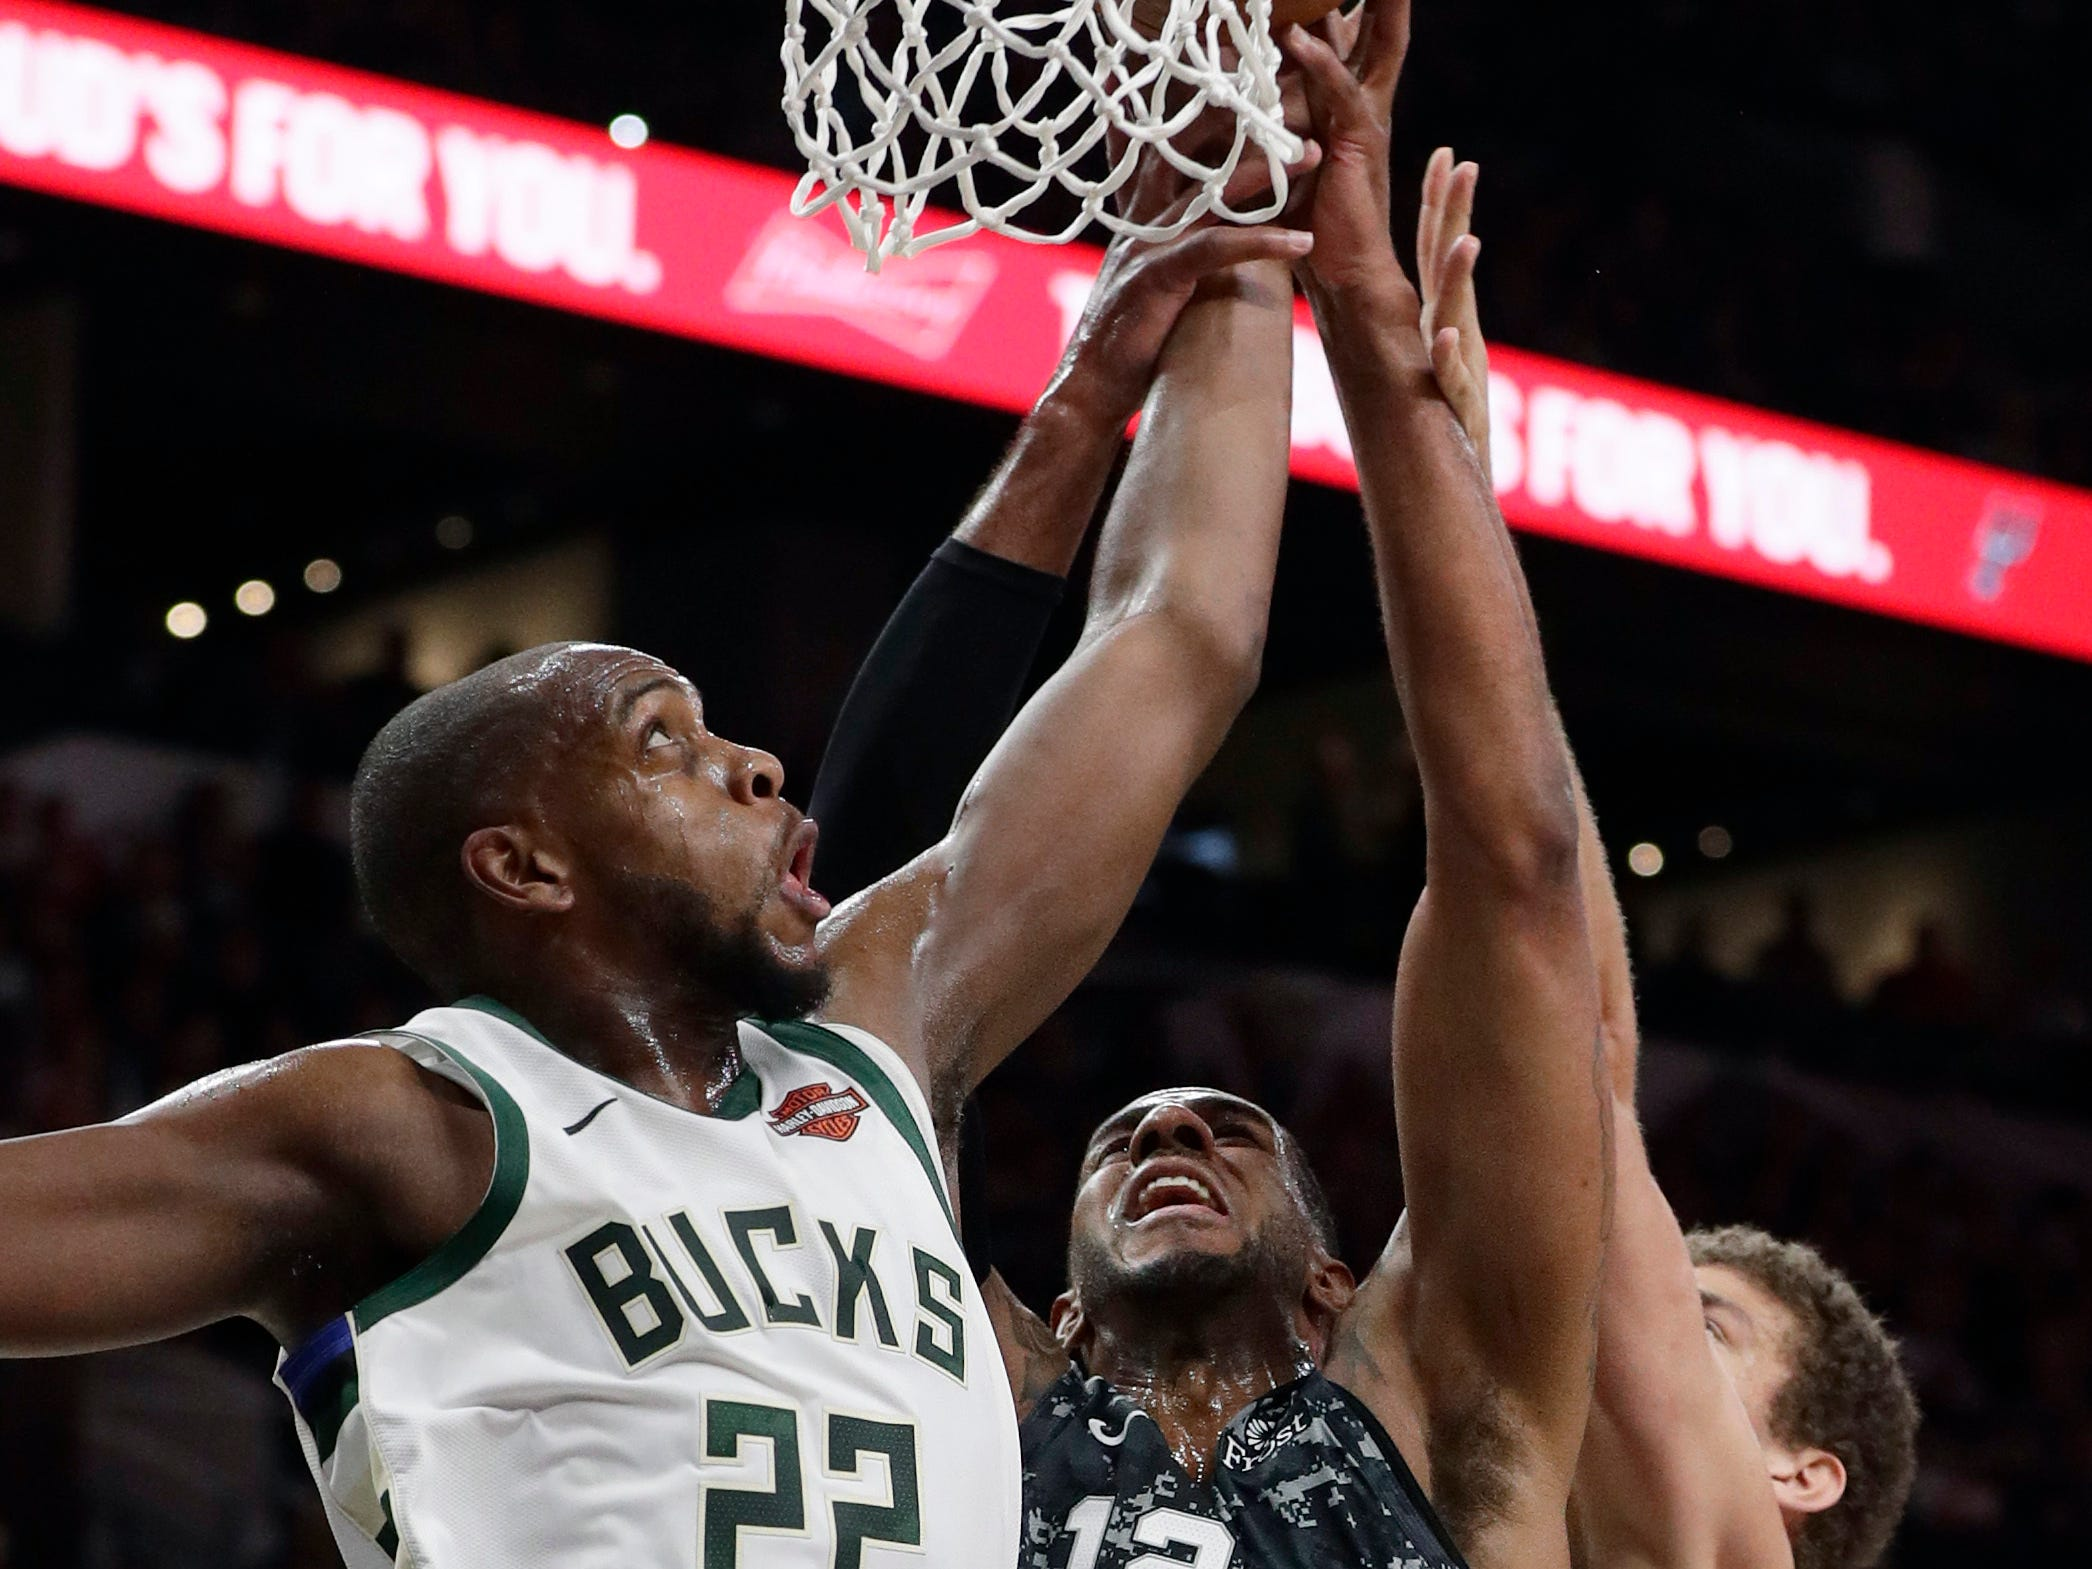 Spurs center LaMarcus Aldridge battles Bucks forward Khris Middleton (22) and center Brook Lopez for a rebounds during the first half.